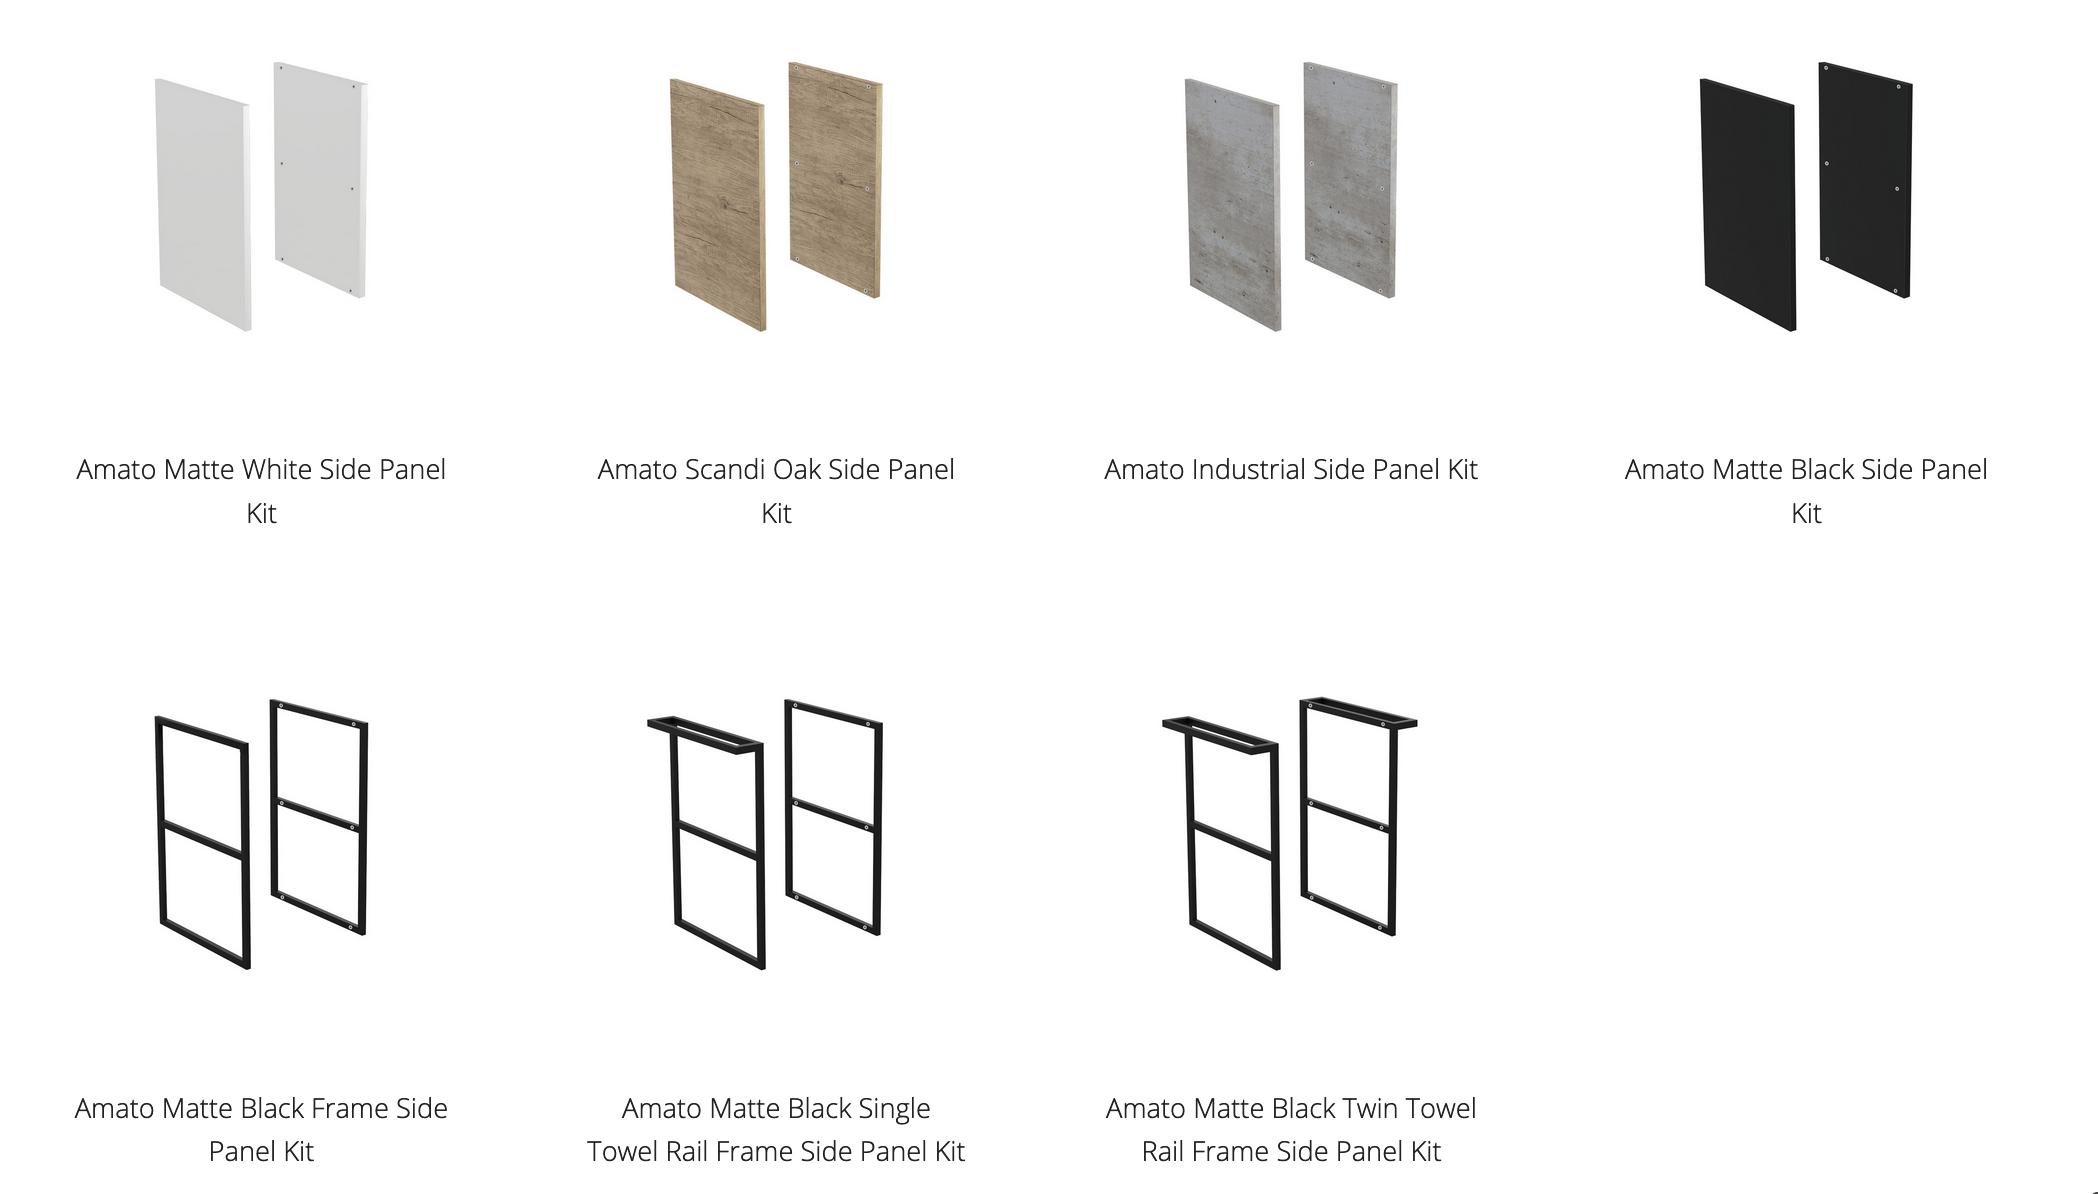 fienza-amato-side-panels.png